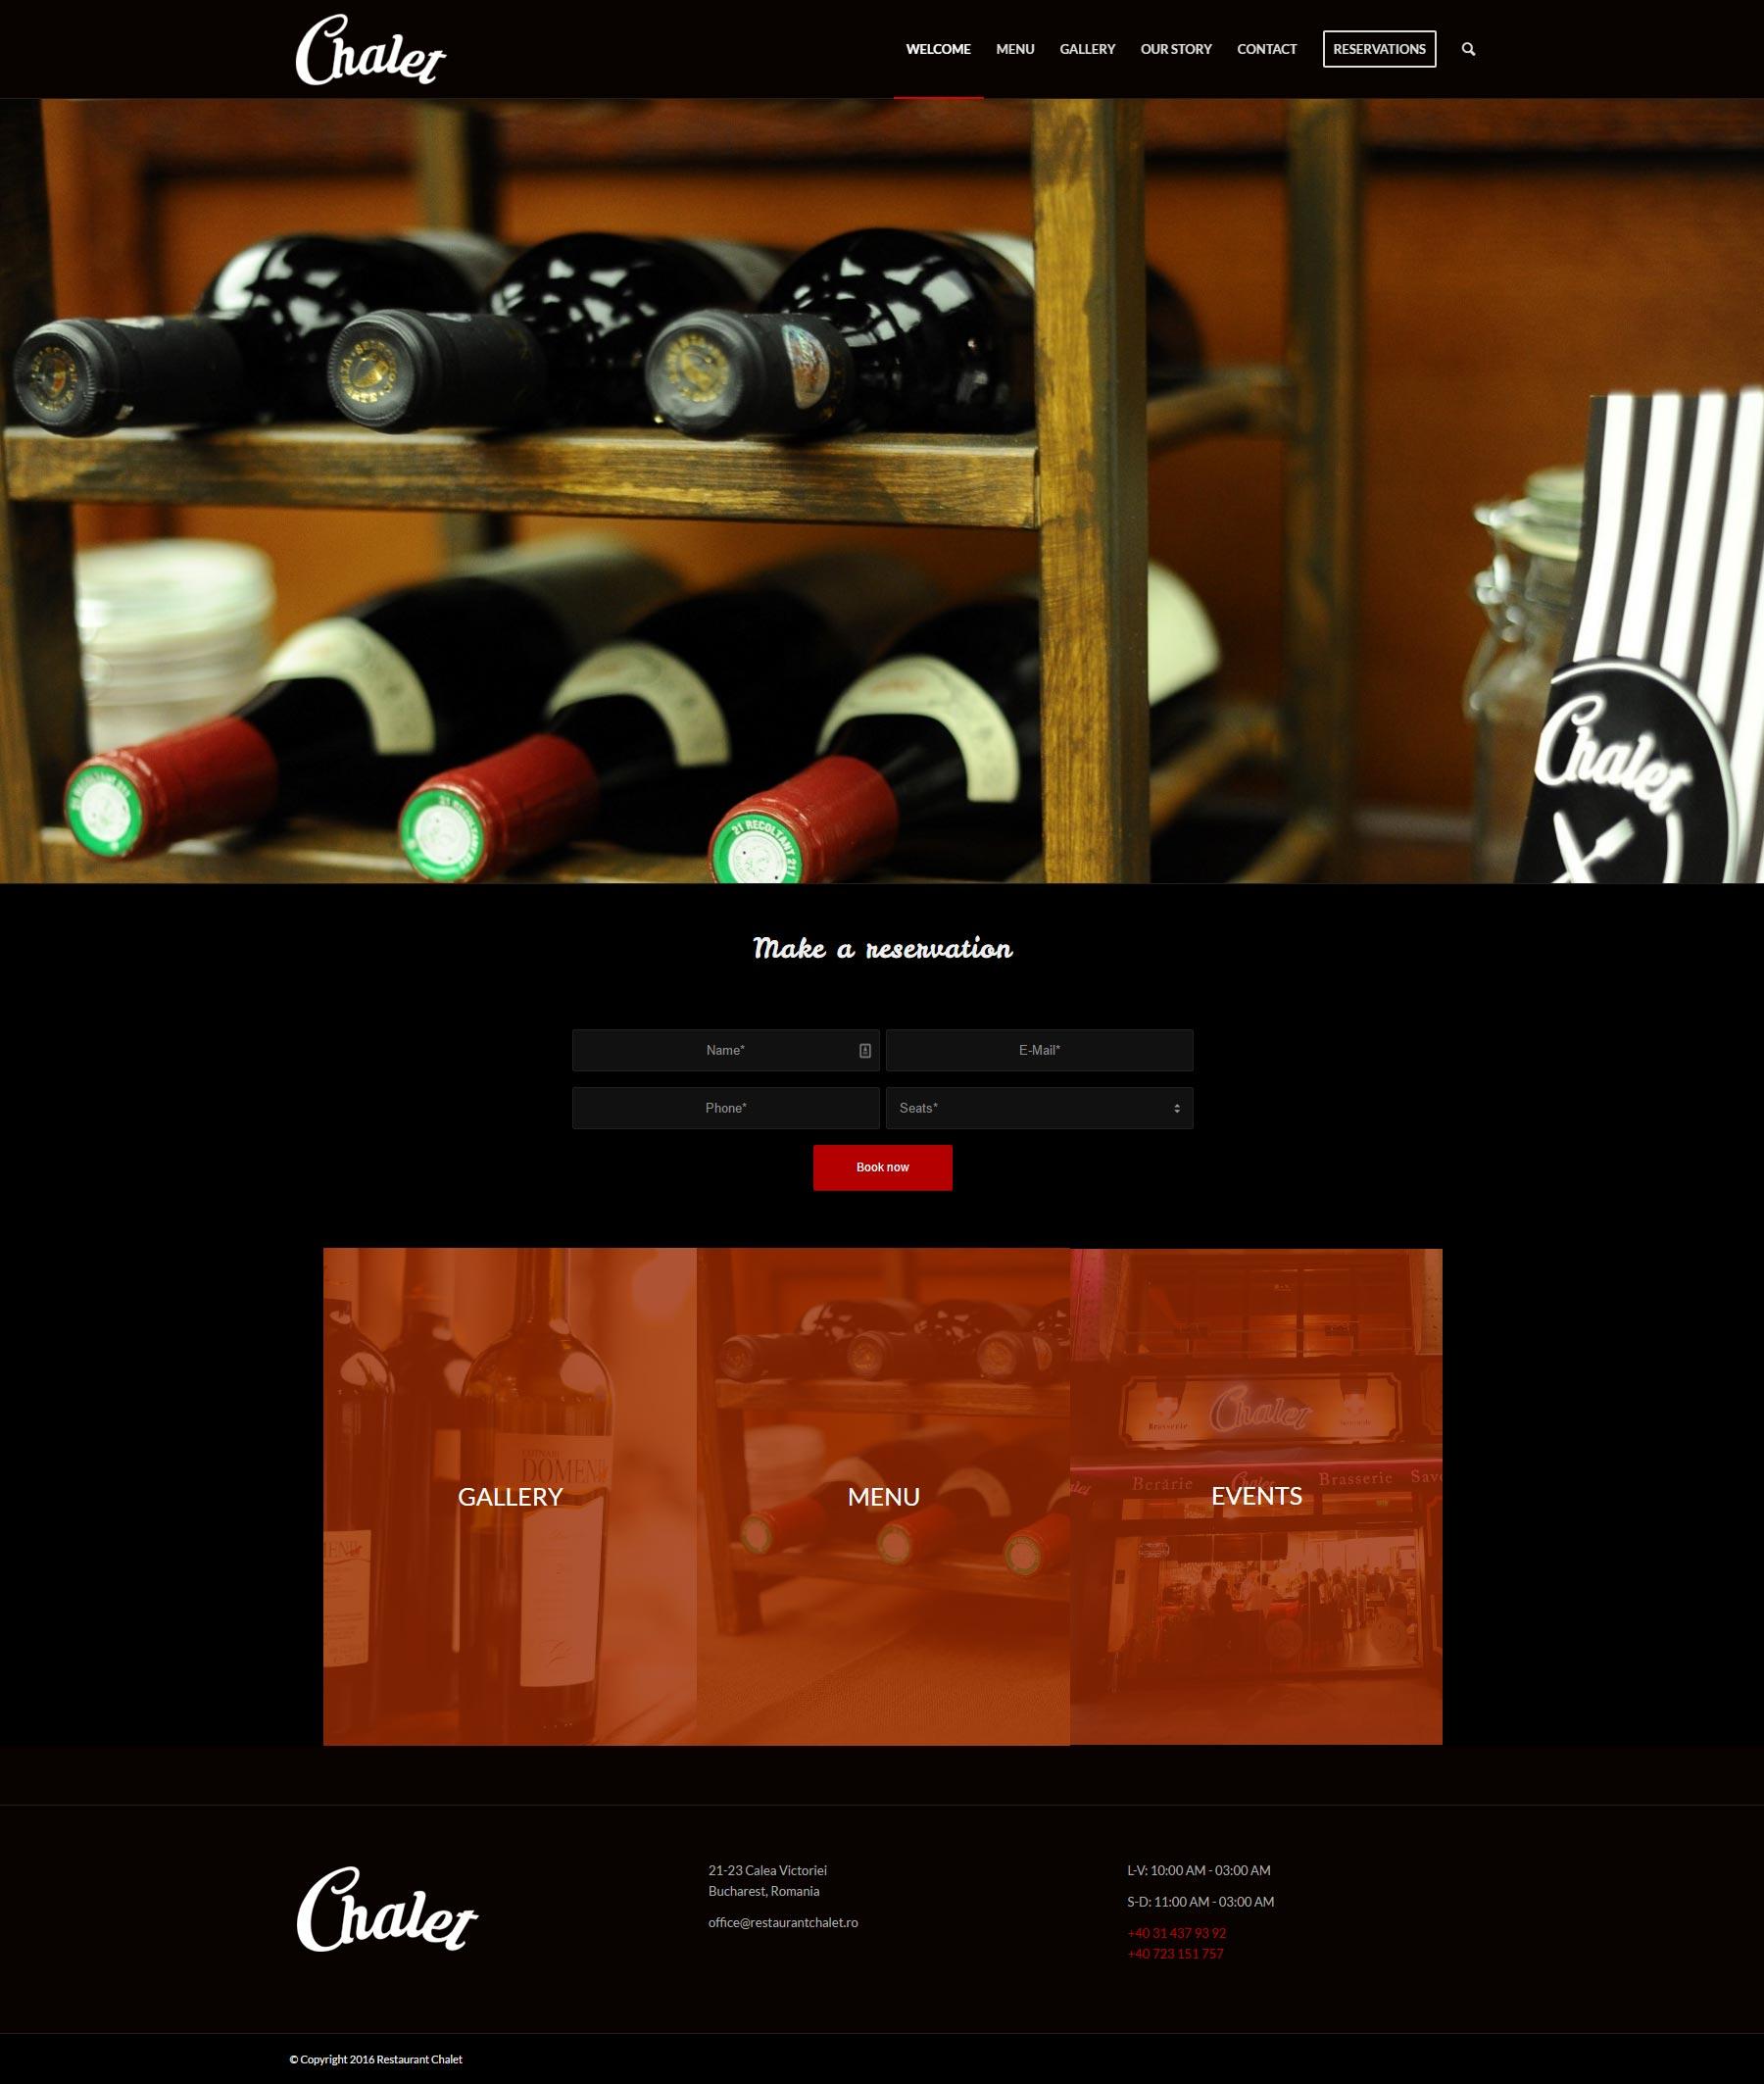 kgds.ro-project-chalet-restaurantchalet.ro